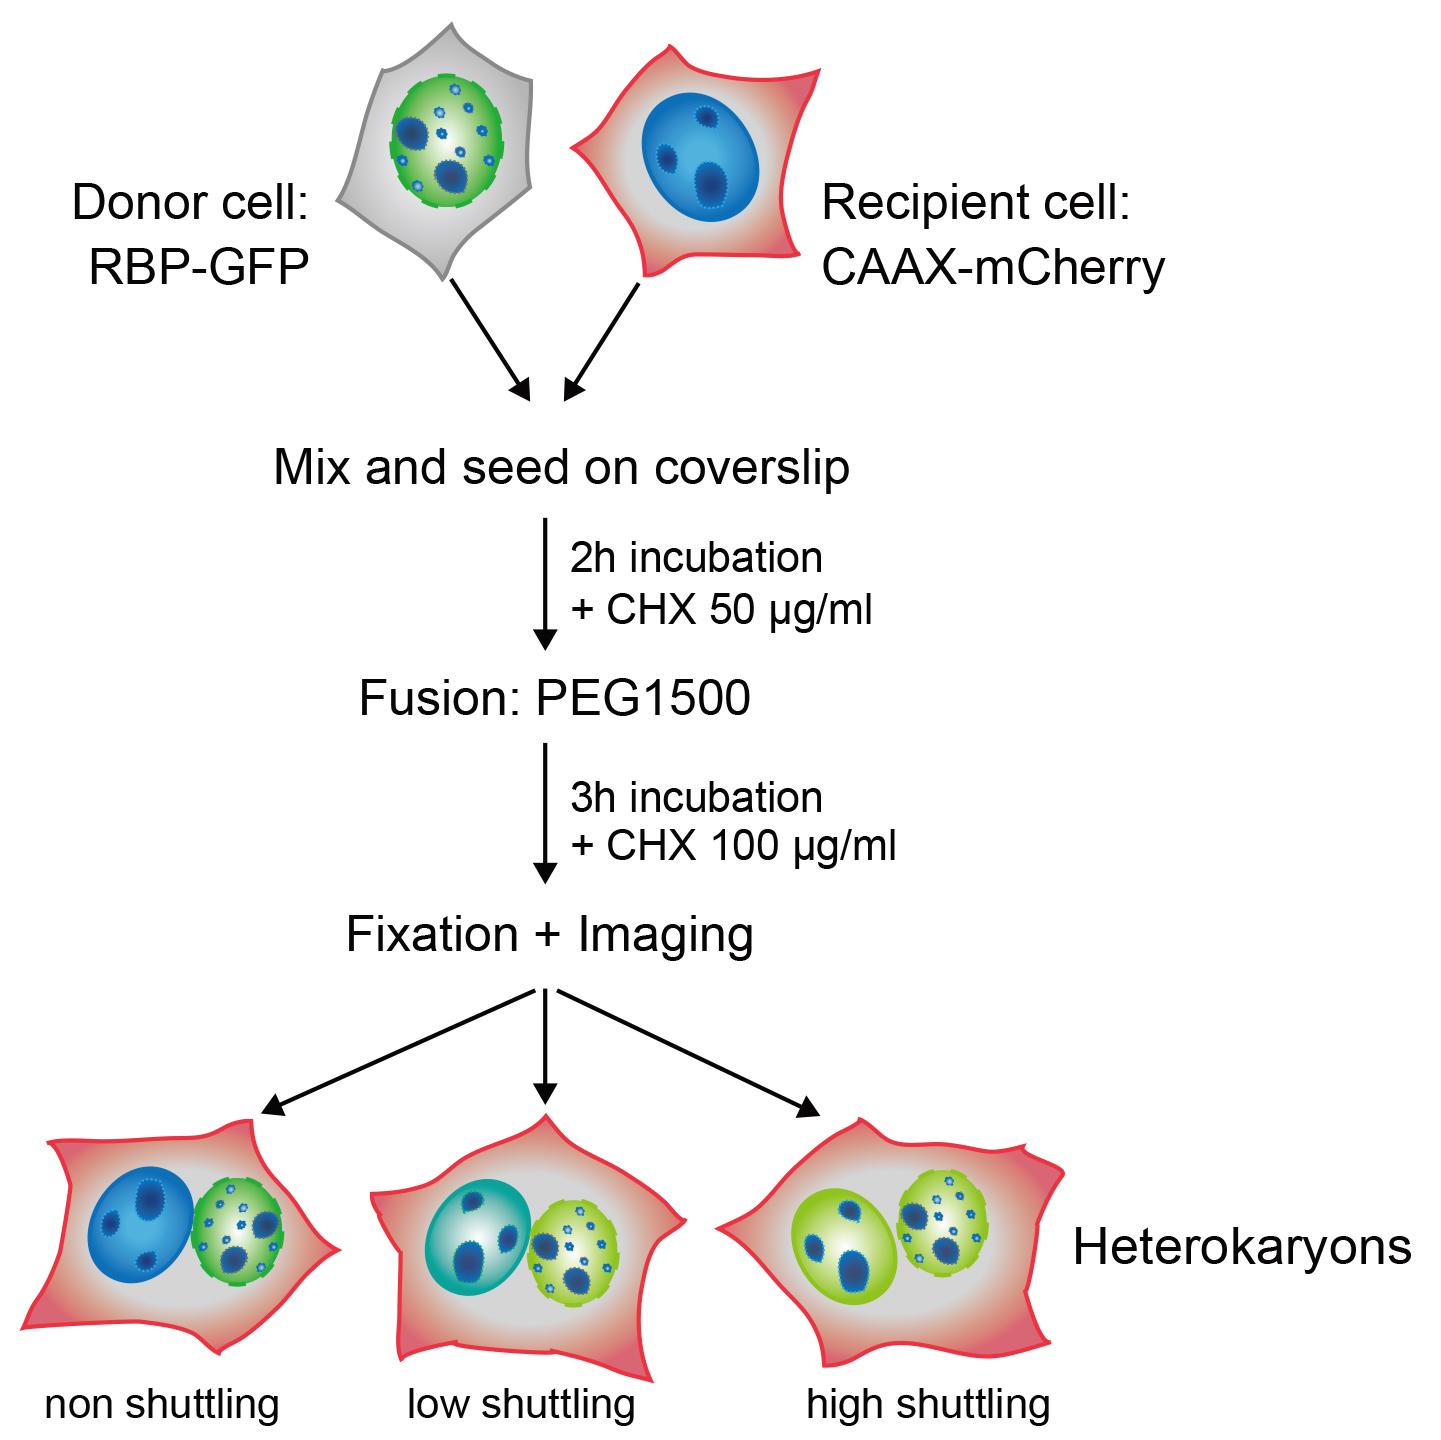 A Quantitative Heterokaryon Assay To Measure The Nucleocytoplasmic